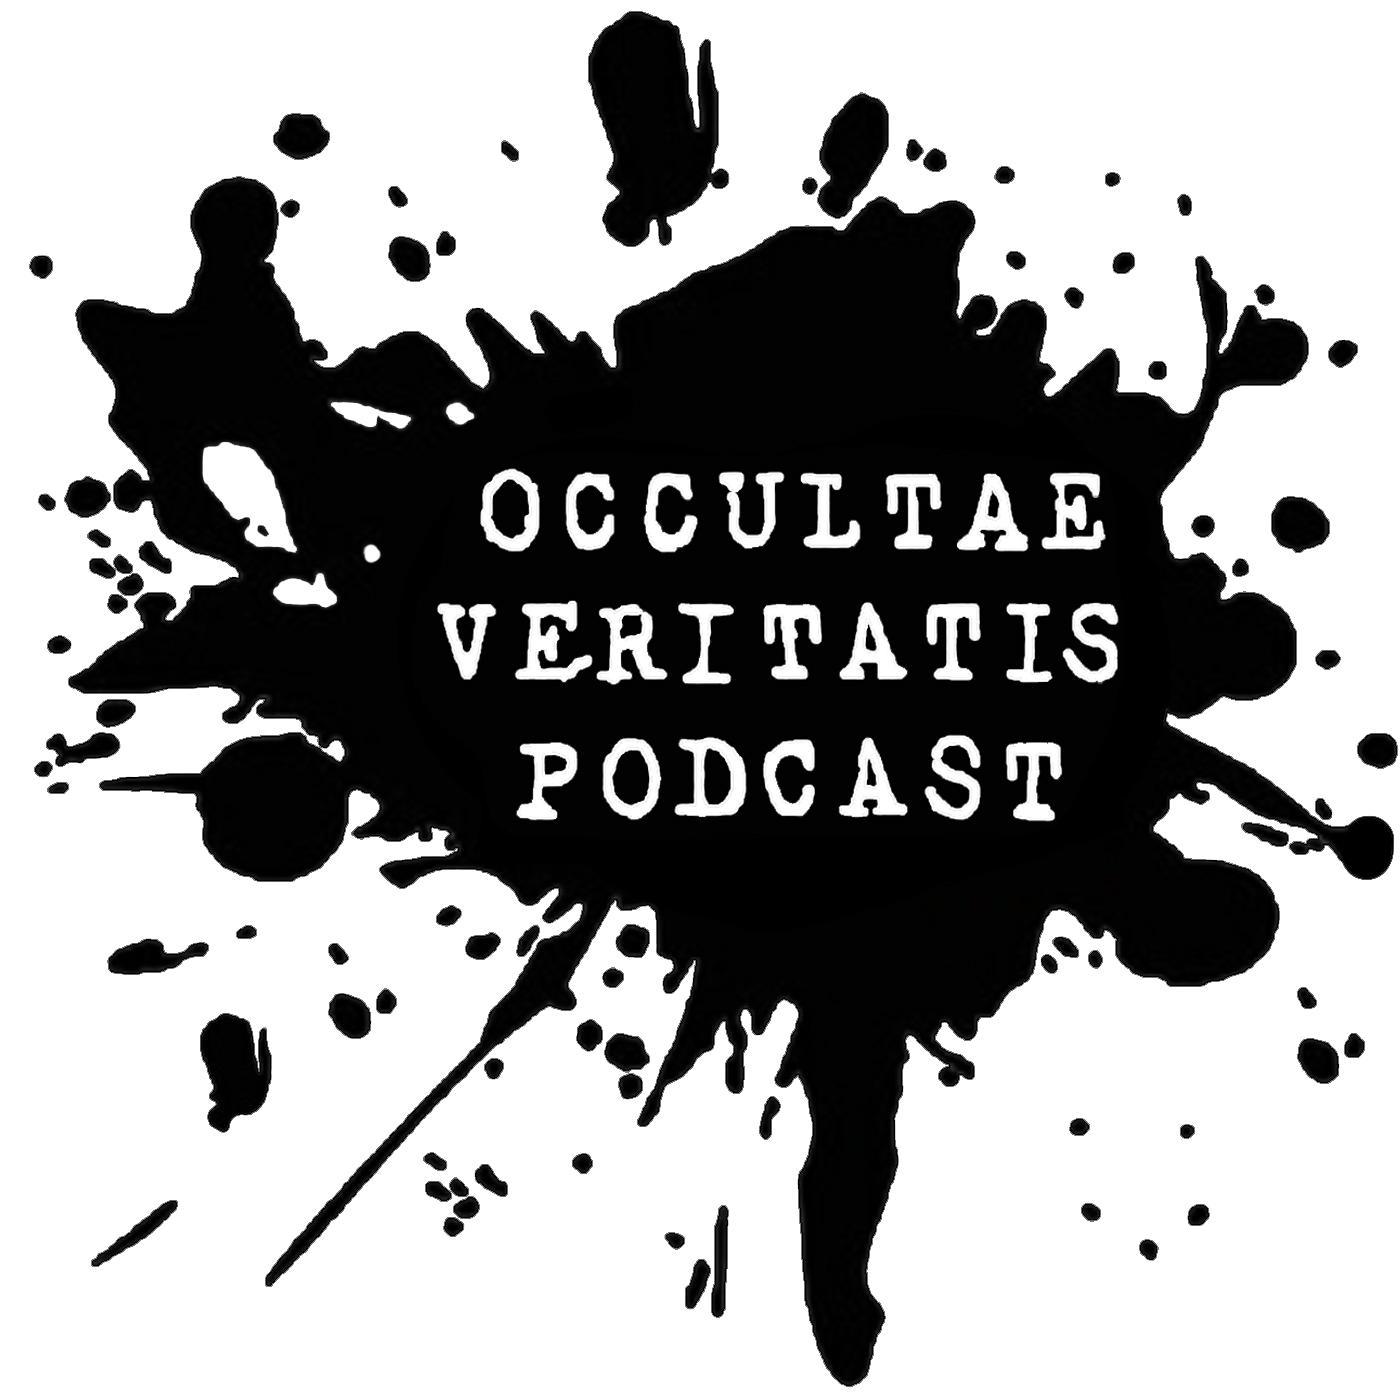 Occultae Veritatis Podcast - OVPOD show art